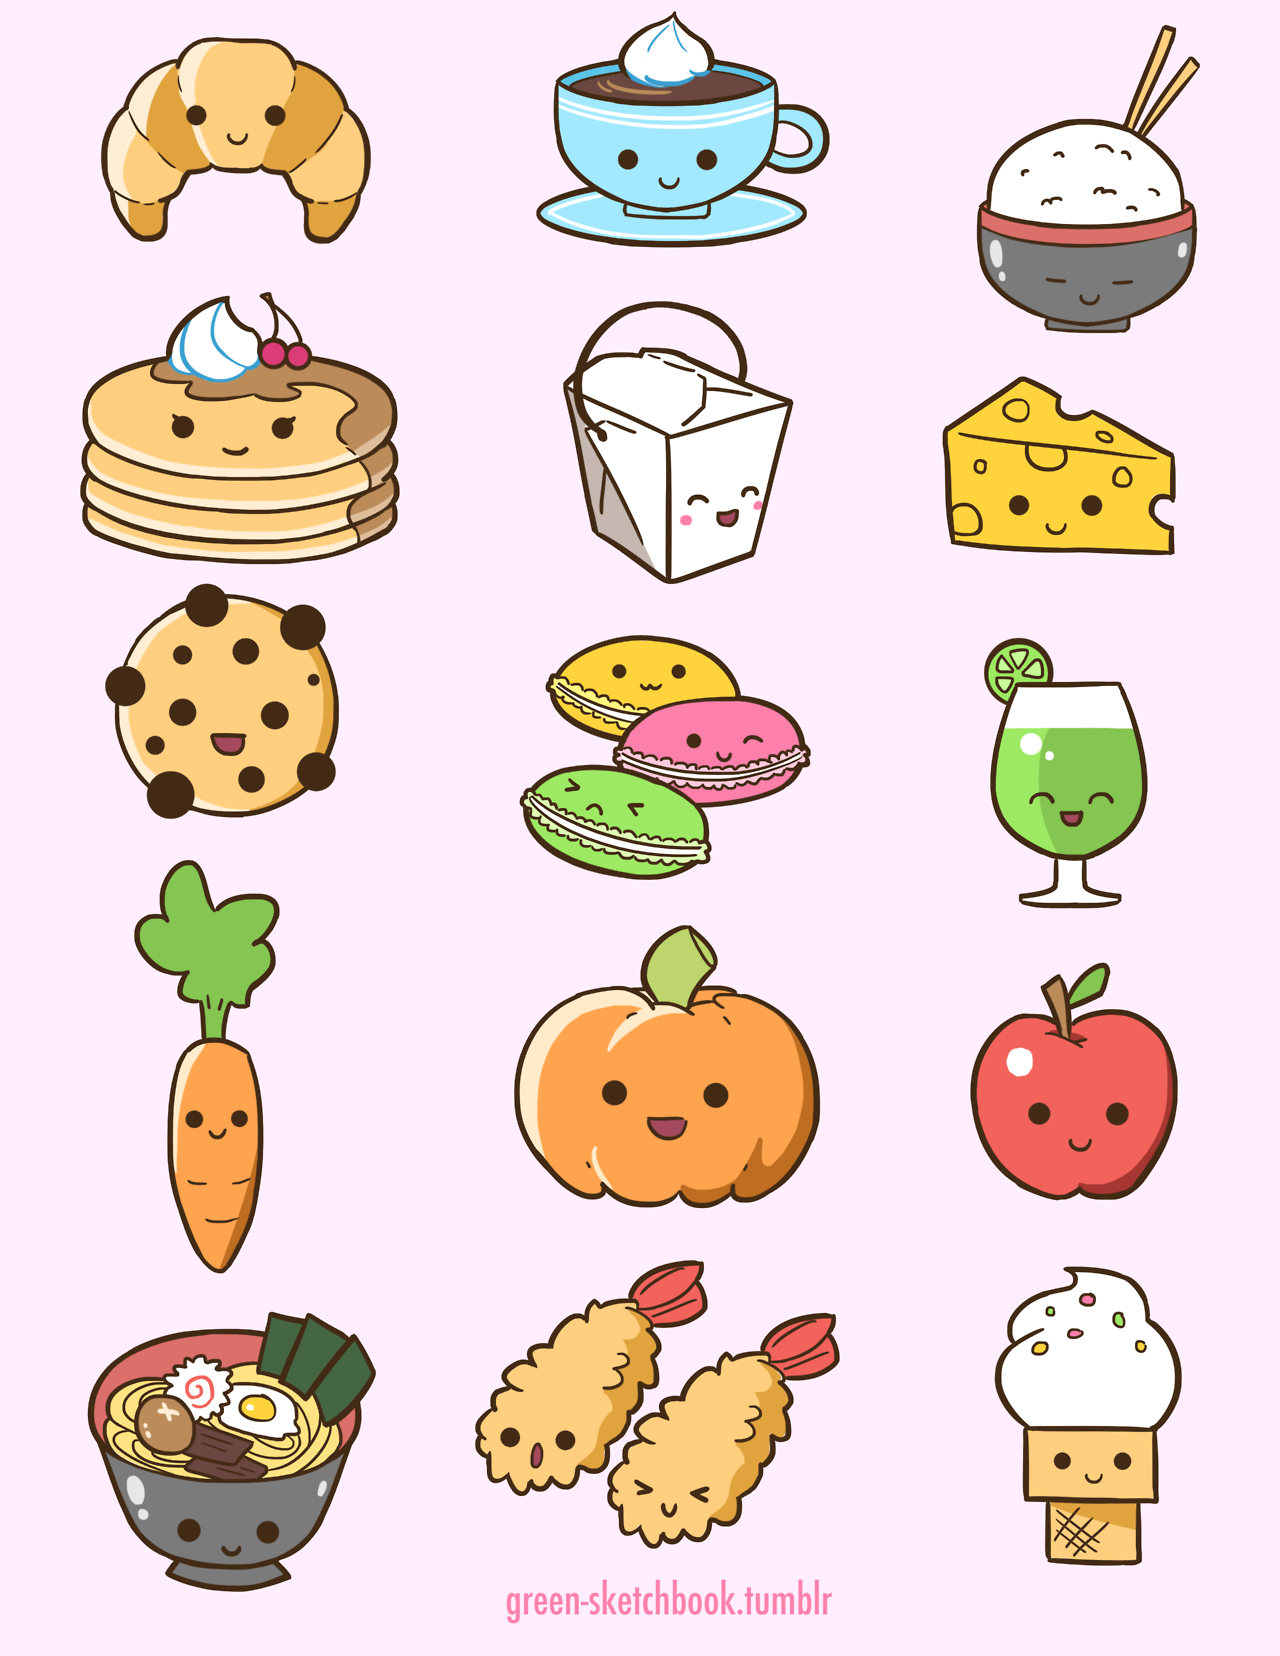 Kawaii Food Drawings : kawaii, drawings, JapanCandyBox.com, Japanese, Candy, Subscription, Drawings,, Kawaii, Doodles,, Drawings